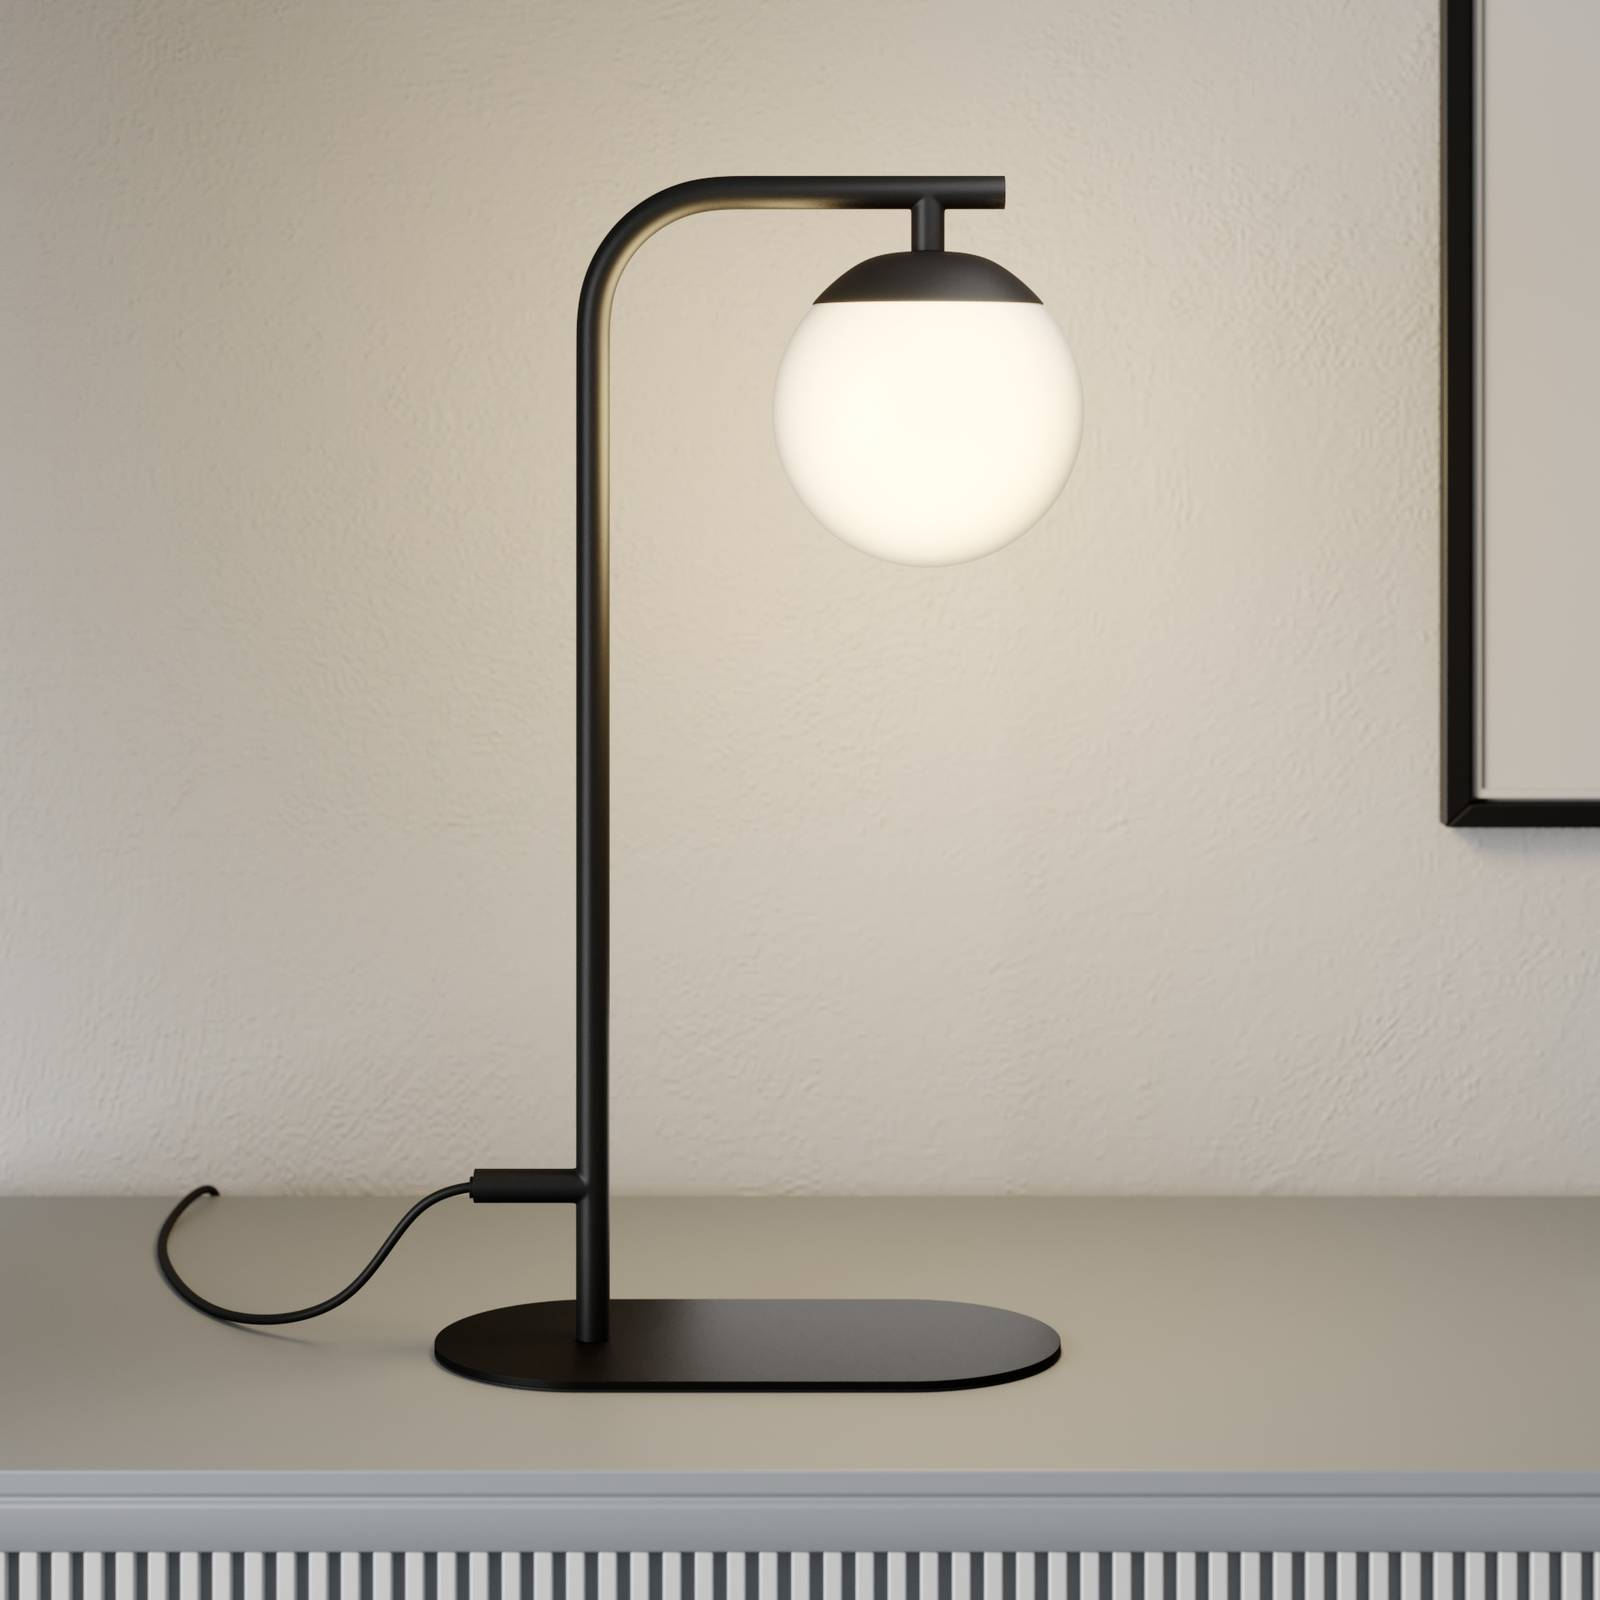 Lucande Rama -LED-pöytävalaisin lasivarjostimella